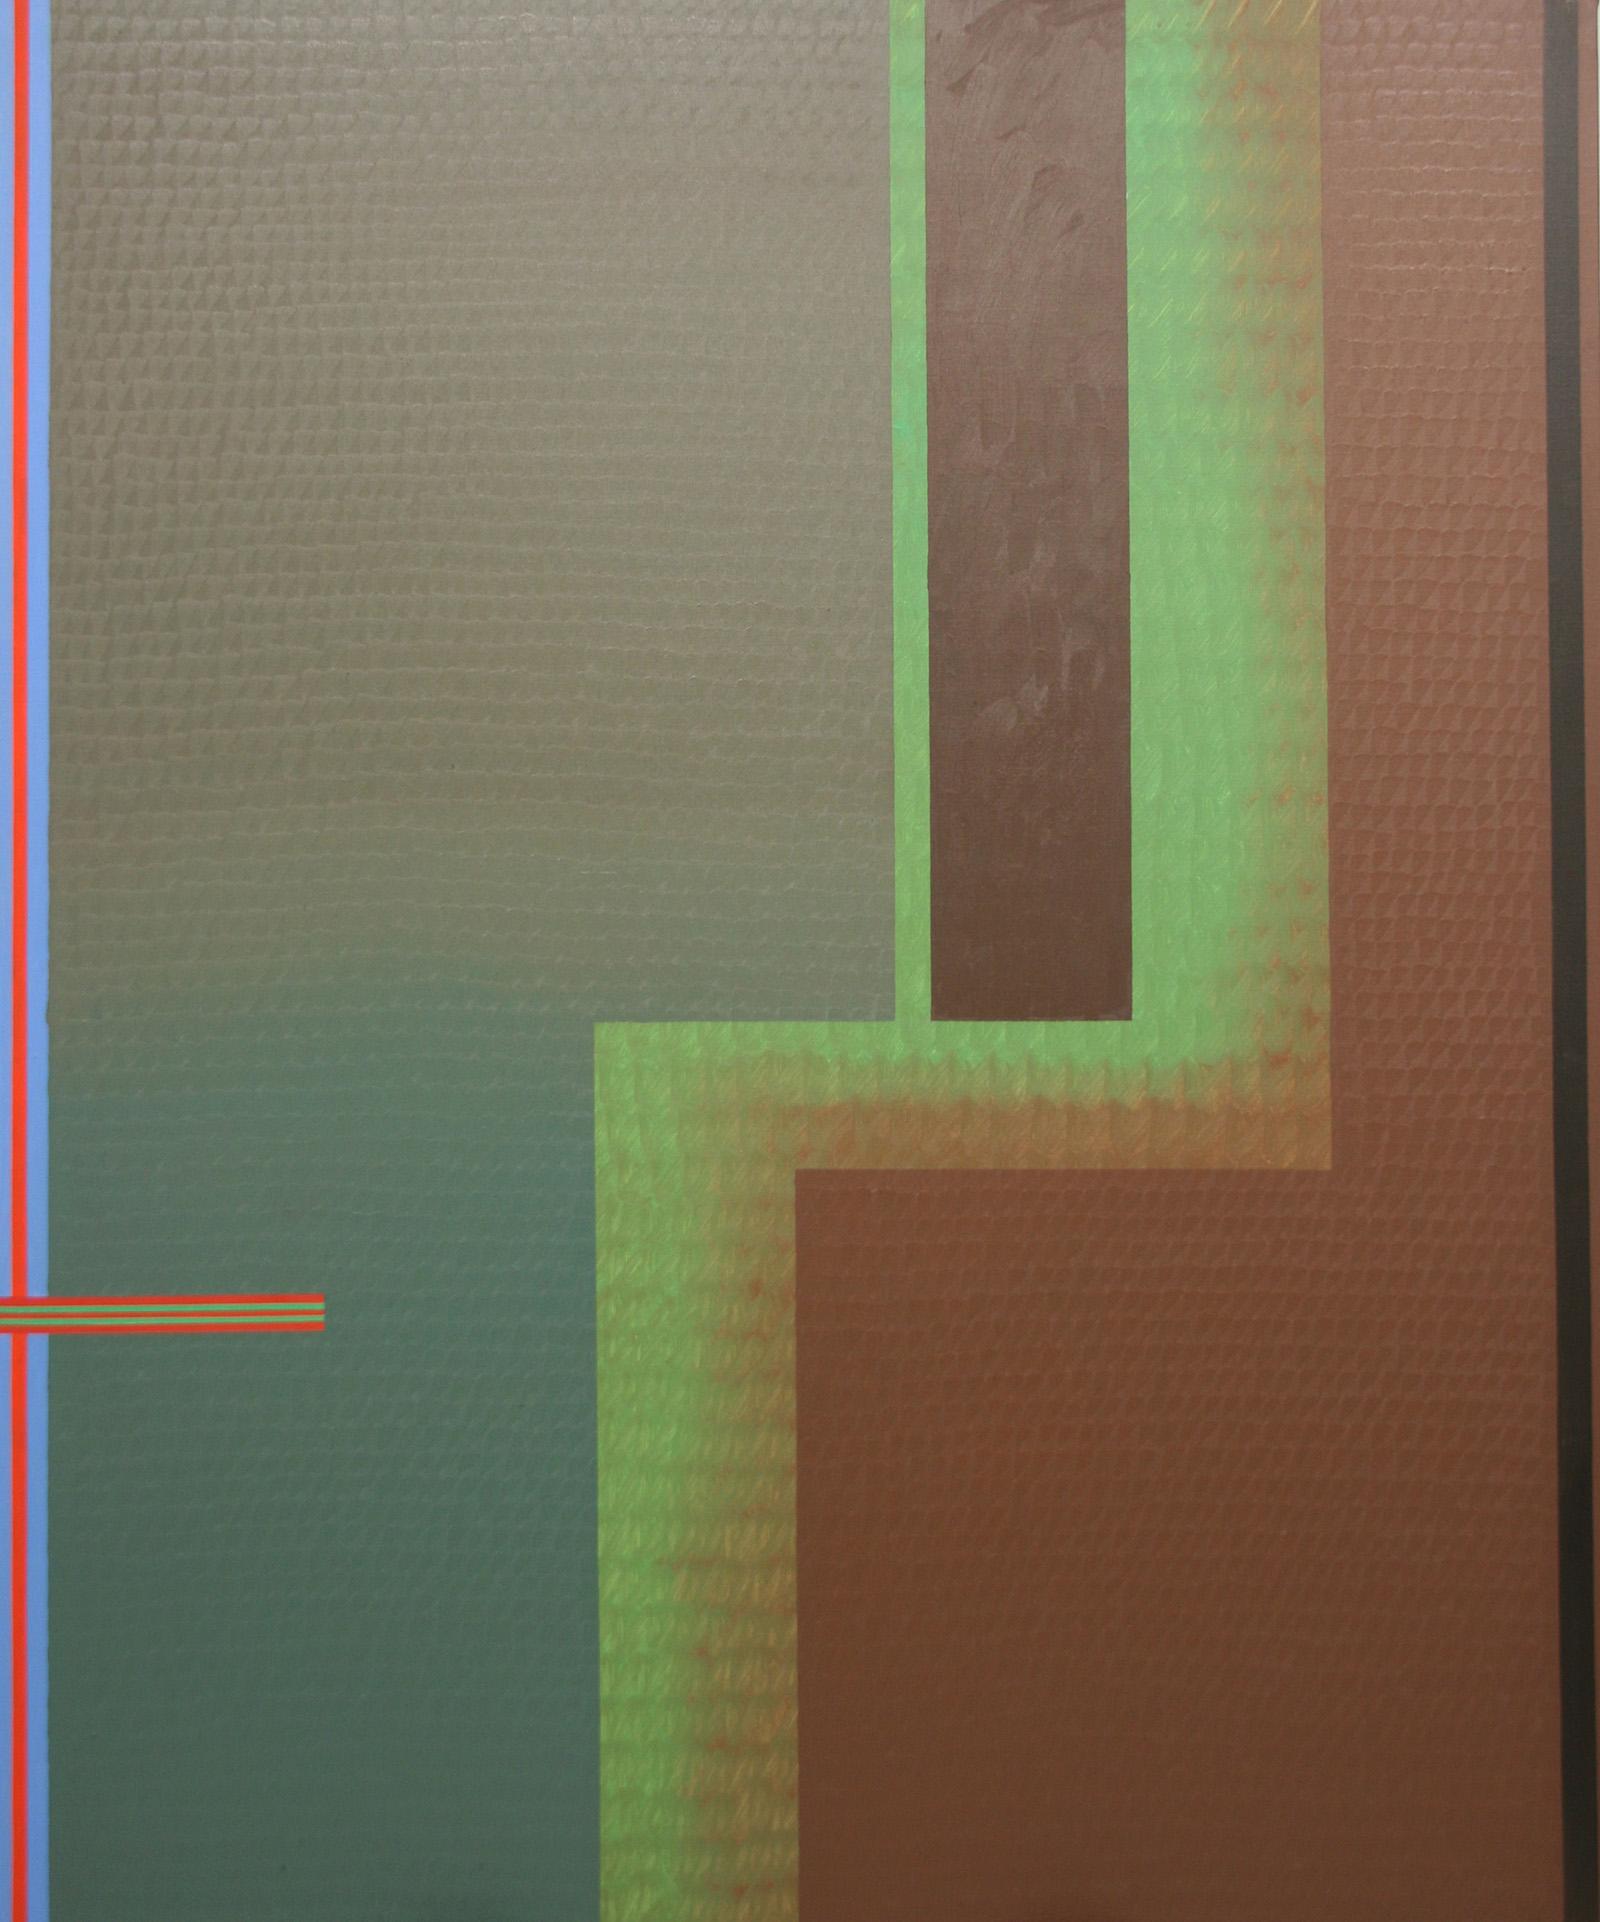 Resee -oil on canvas 195 x 162 cm- 2016 Miquel Gelabert